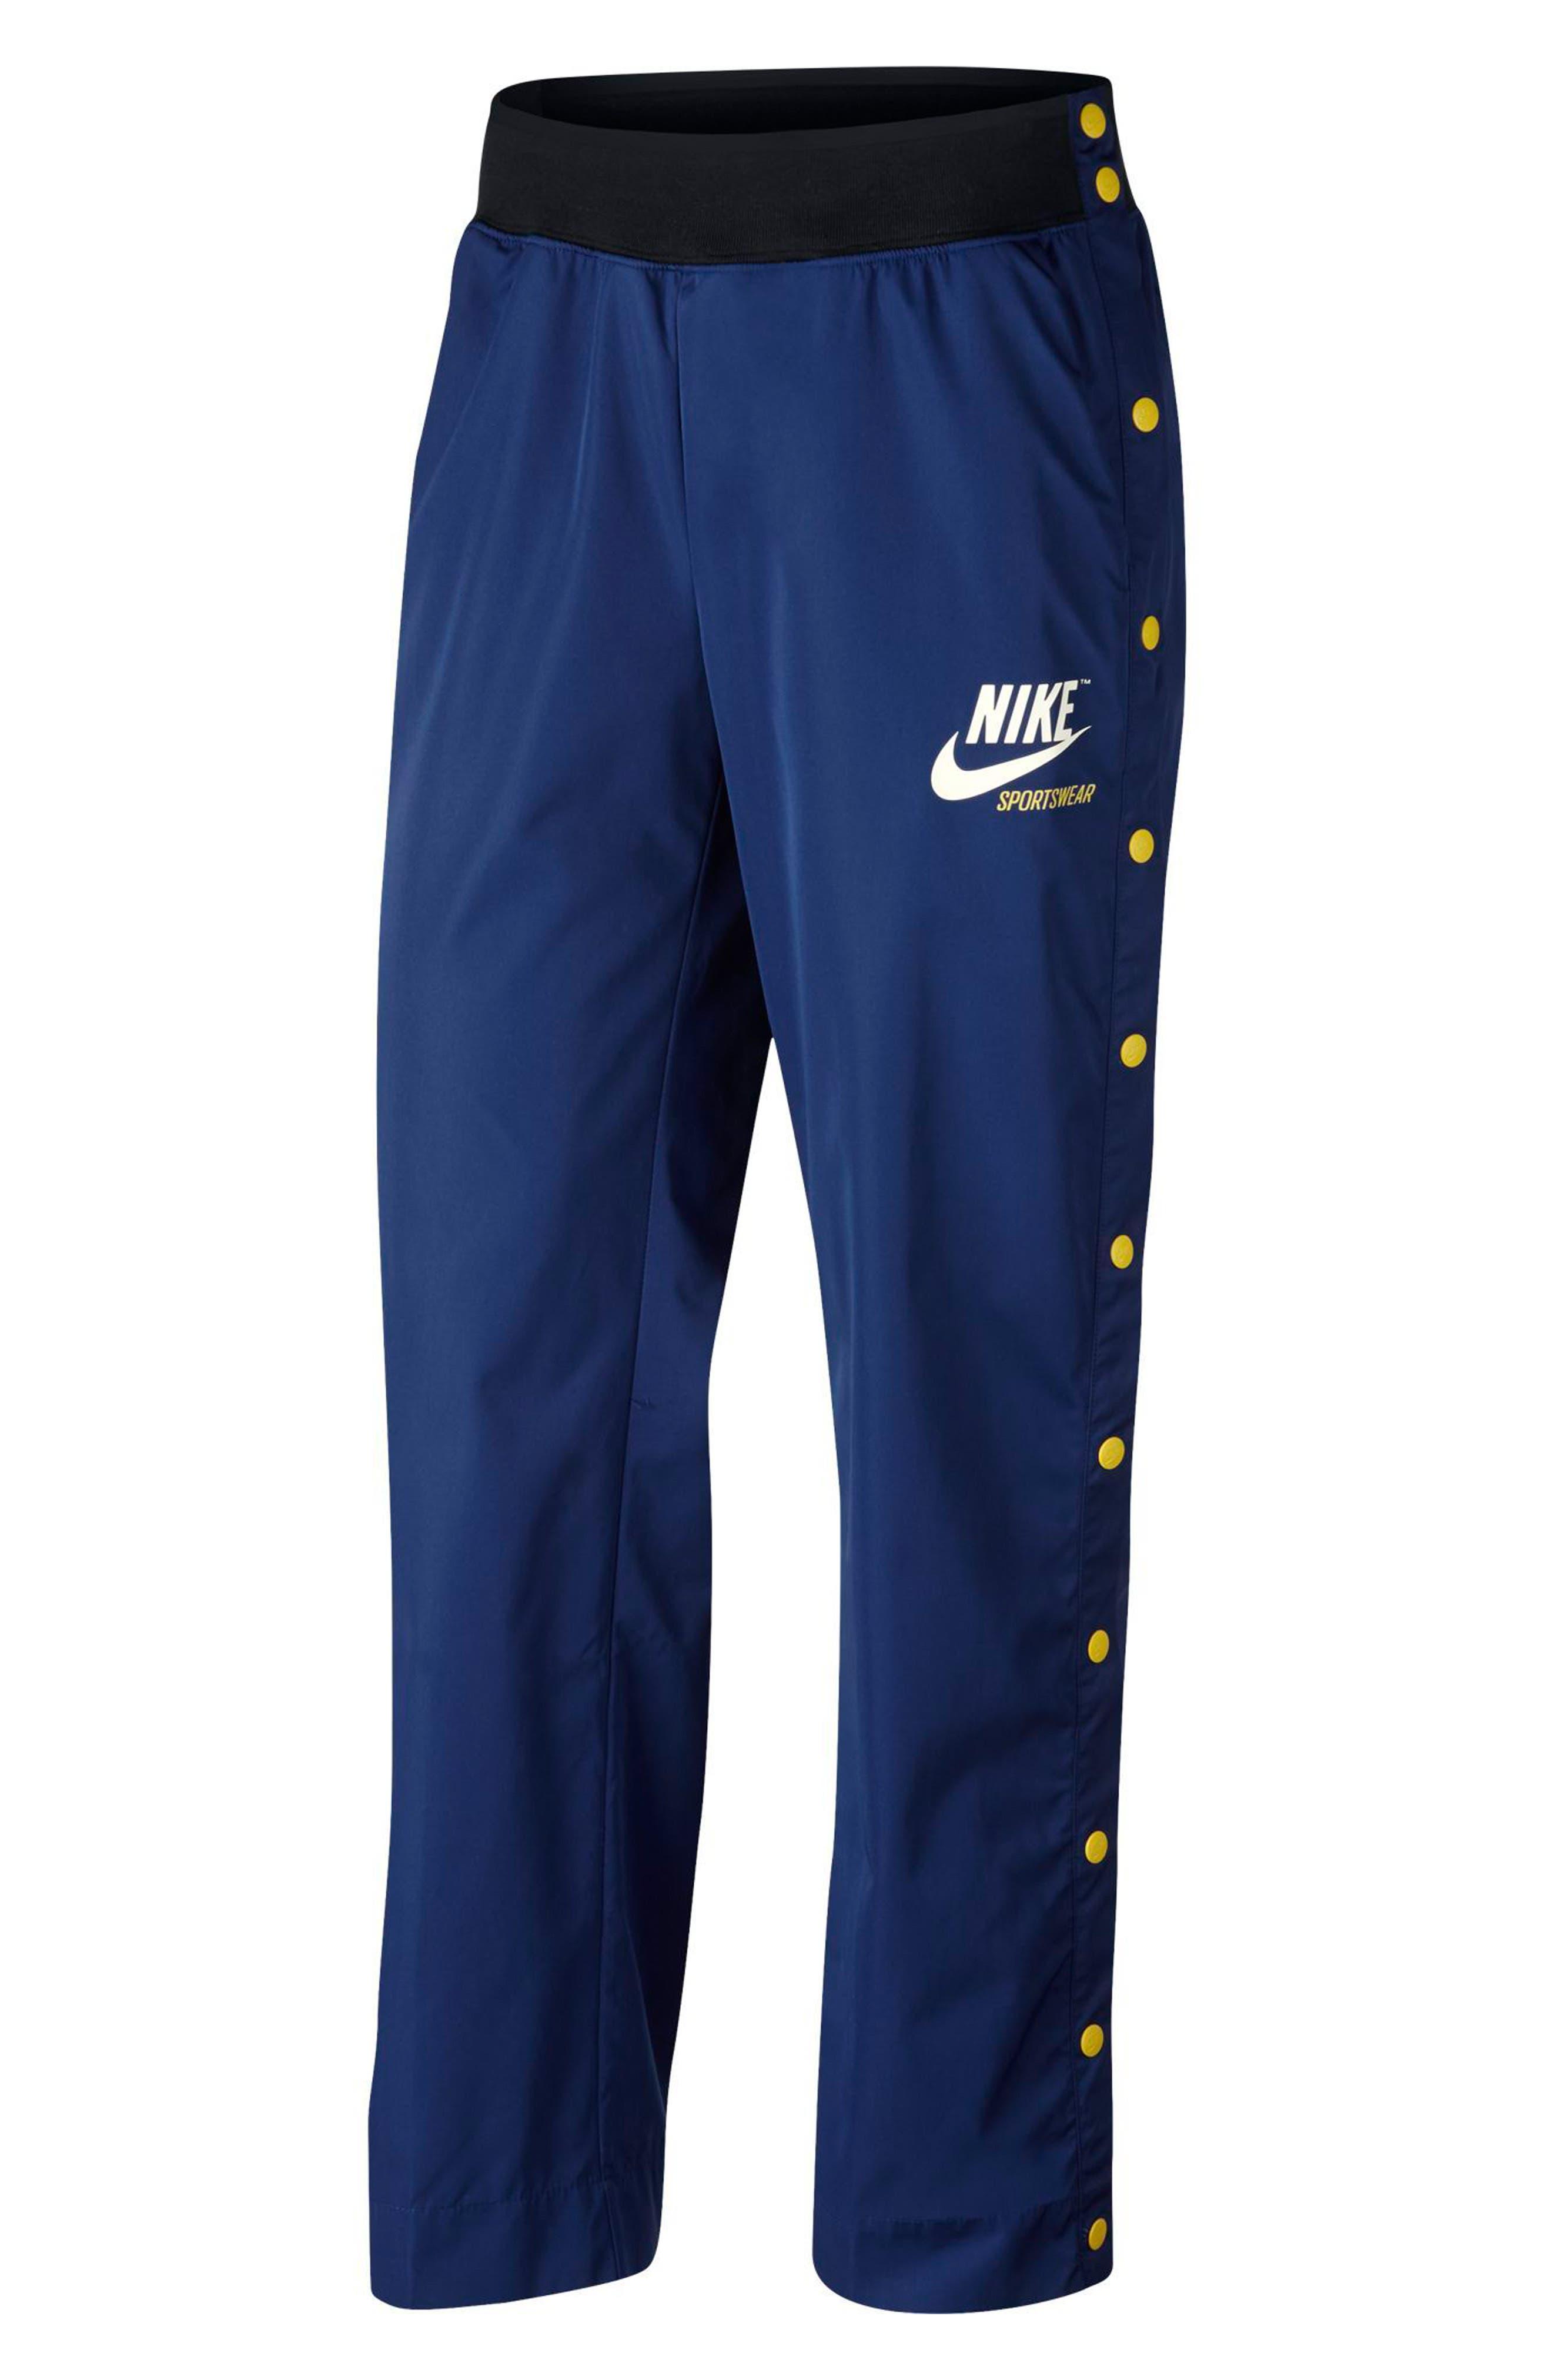 Sportswear Women's Side Snap Pants,                             Main thumbnail 1, color,                             455